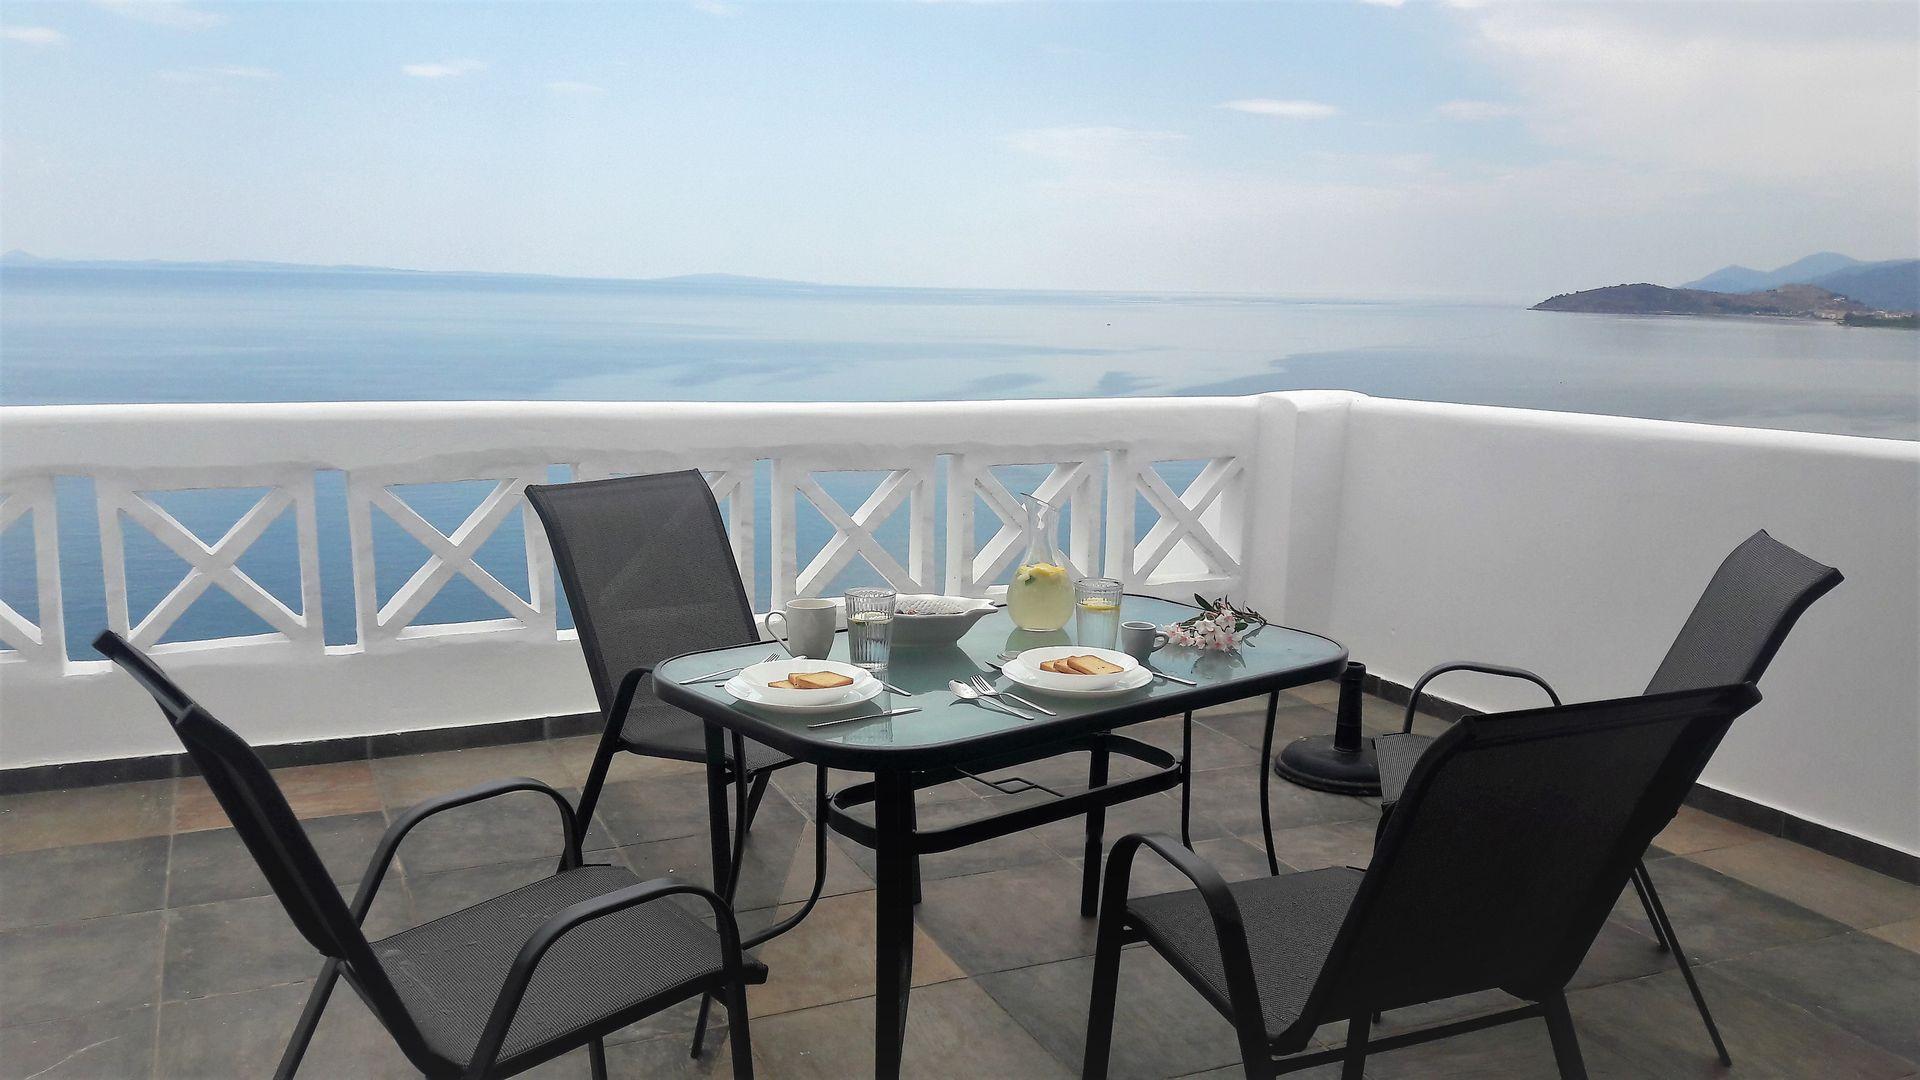 Muses SeaSide Villas - Παράλιο Άστρος, Κυνουρία ✦ 4 Ημέρες (3 Διανυκτερεύσεις) ✦ 2 άτομα + 1 παιδί έως 3 ετών ✦ Χωρίς Πρωινό ✦ 01/09/2021 έως 30/09/2021 ✦ Κοντά σε παραλία!